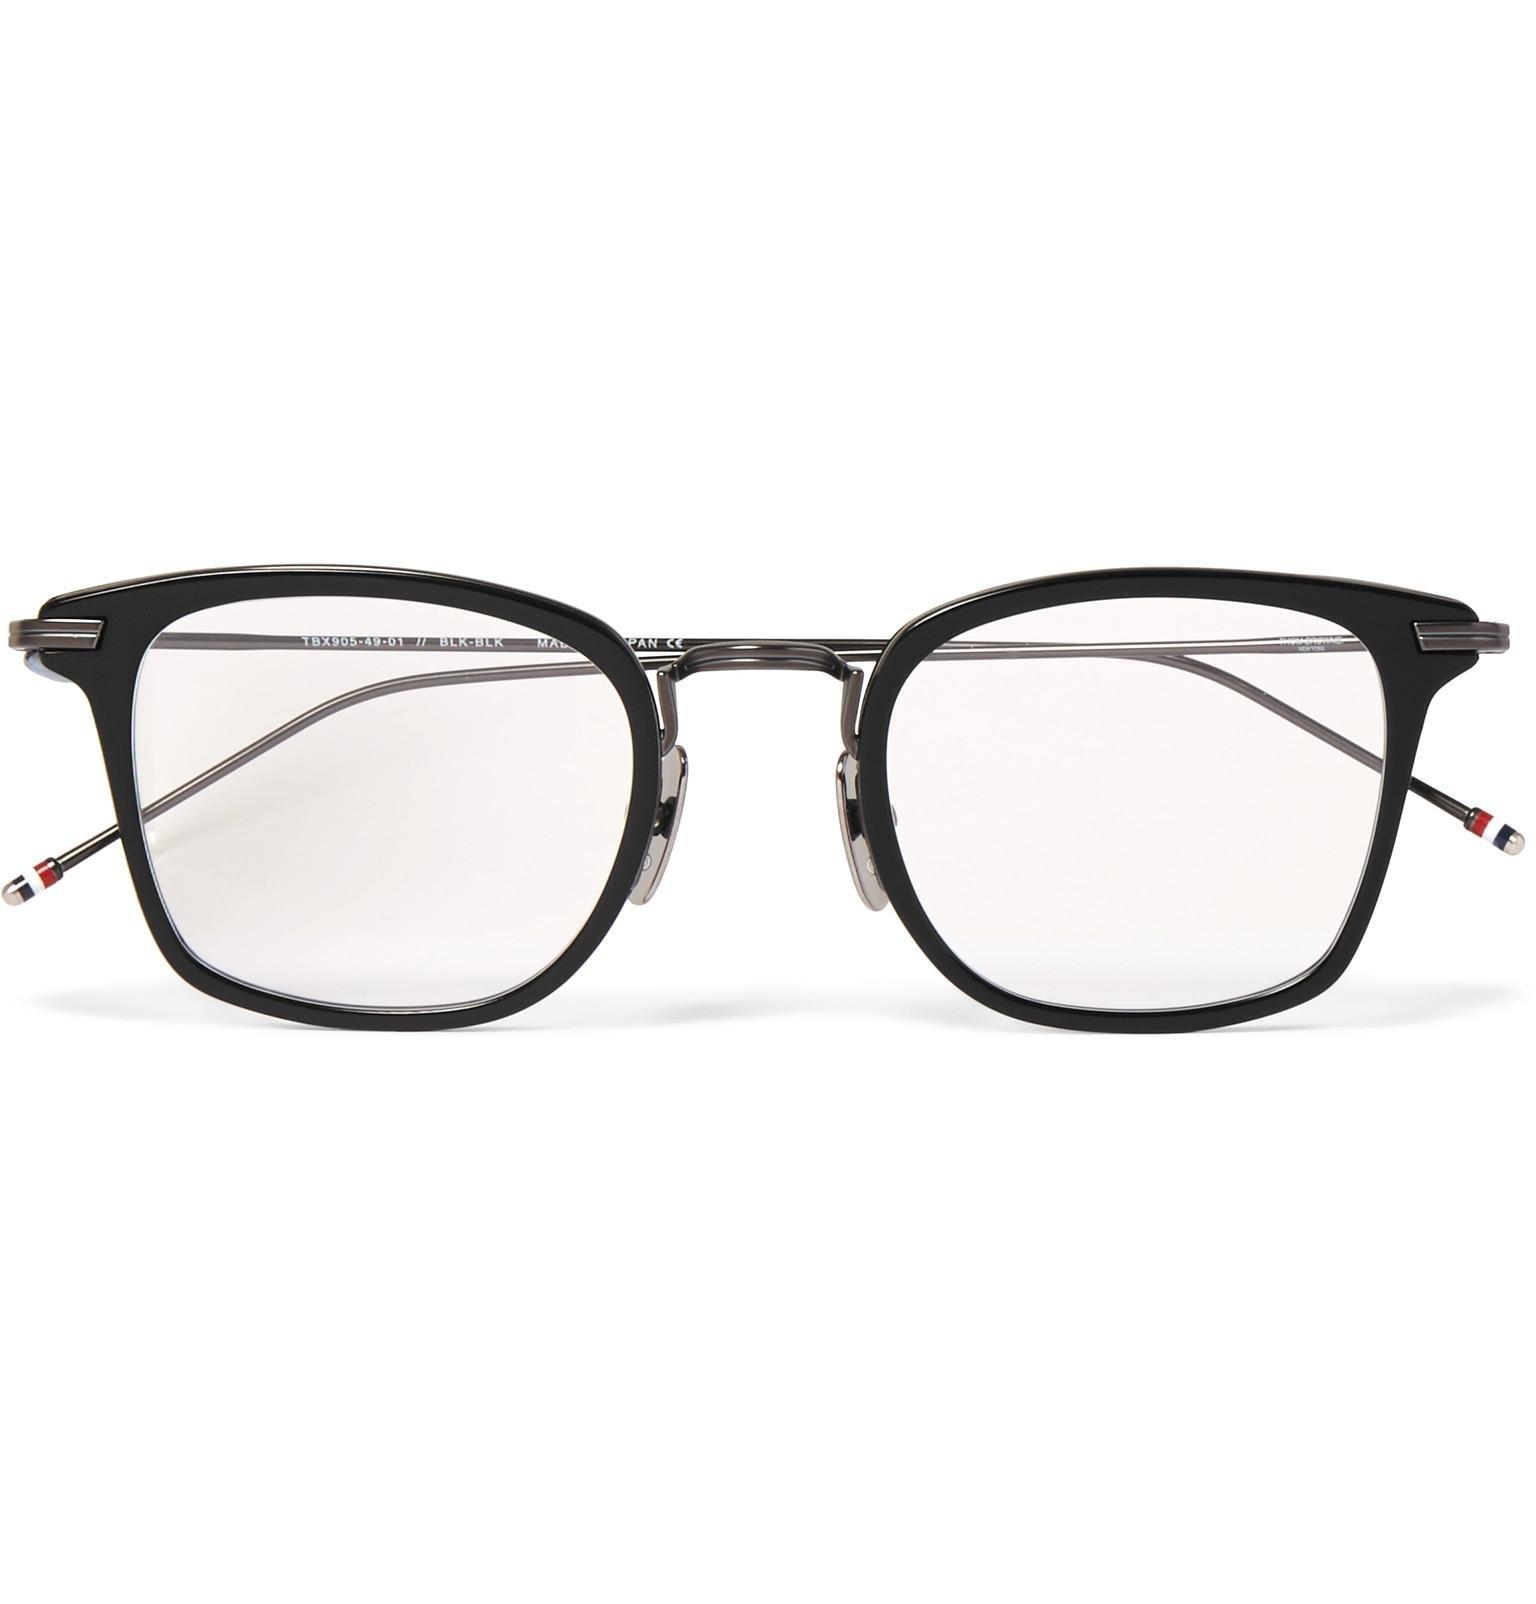 e3075d204b266 Thom Browne Square-frame Acetate And Gunmetal-tone Optical Glasses ...